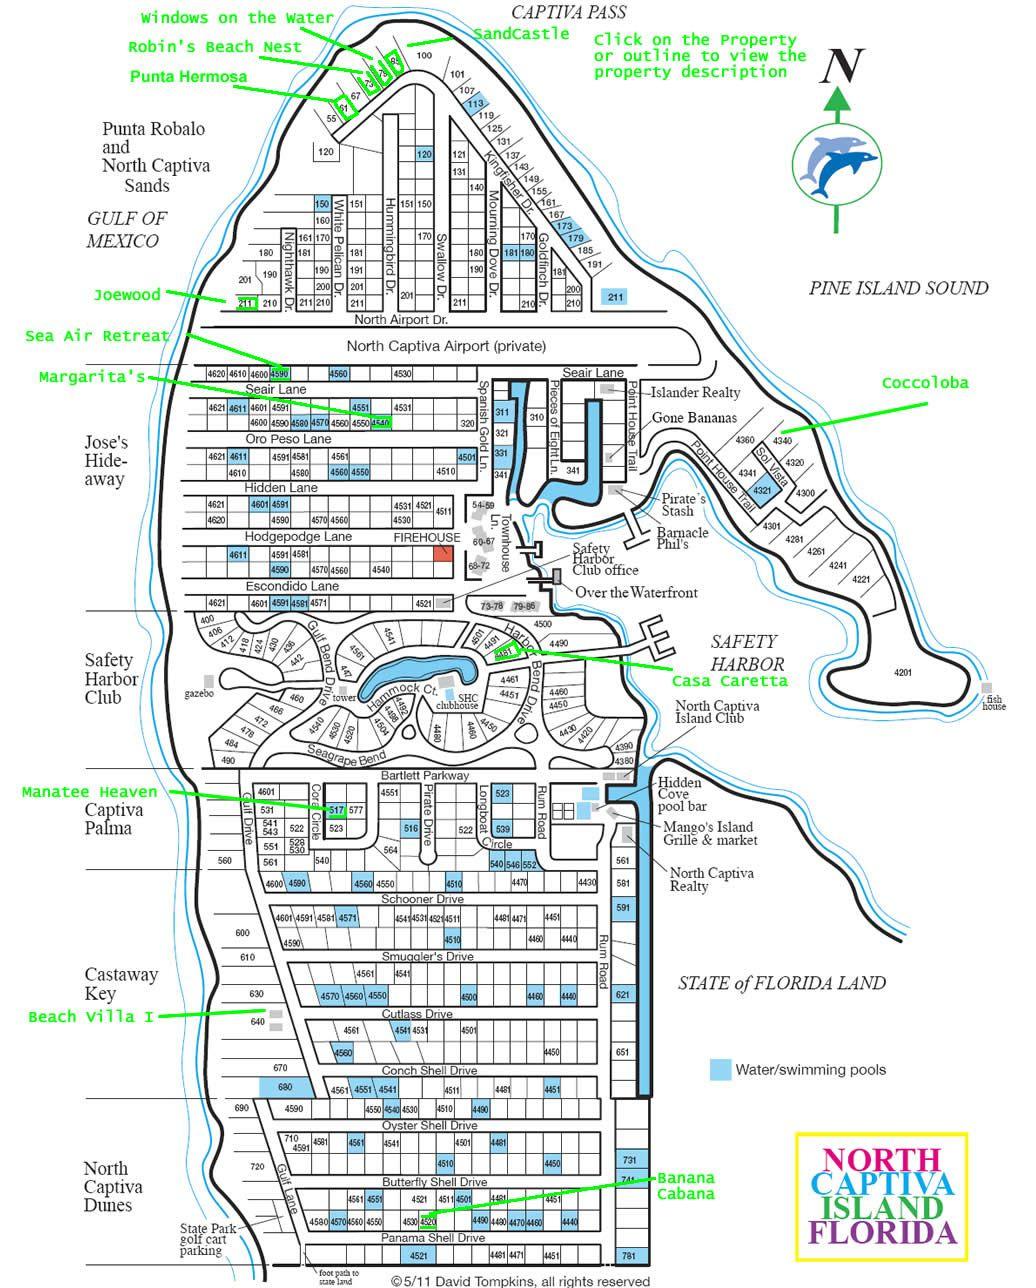 Upper Captiva Island Map. Best Map .   Sanibel And Captiva Islands - North Captiva Island Florida Map